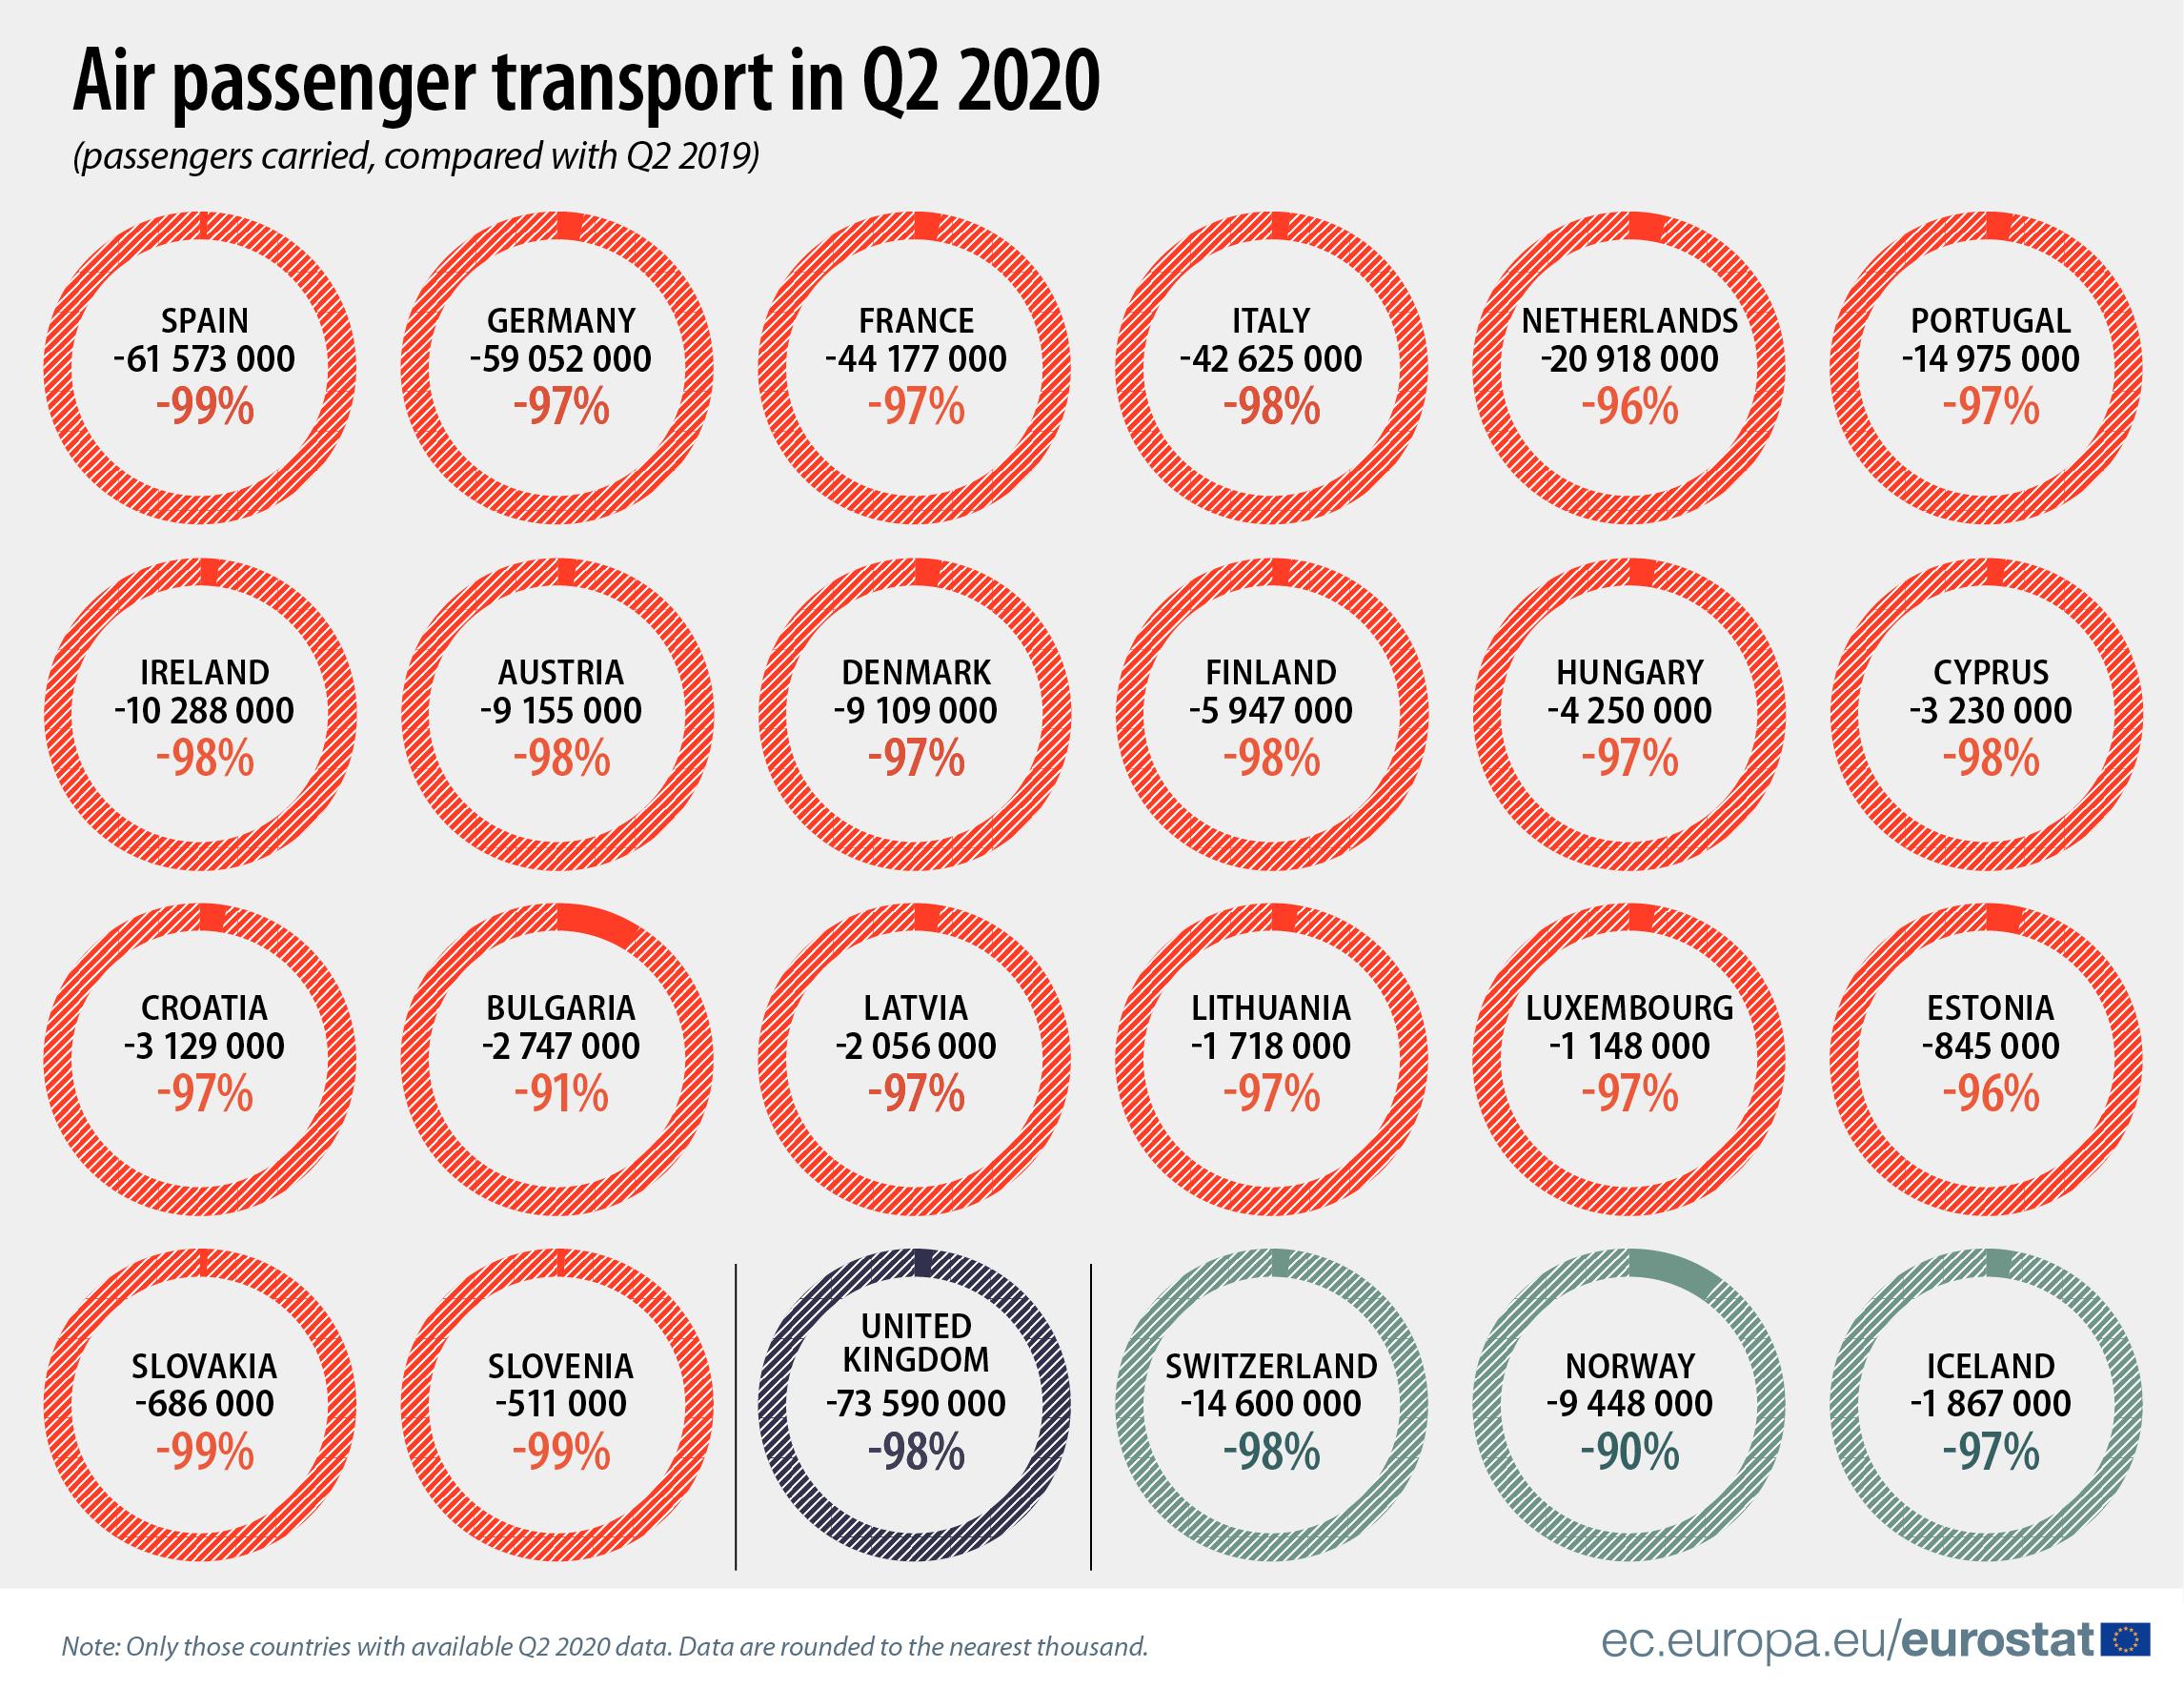 Air passenger transport in Q2 2020